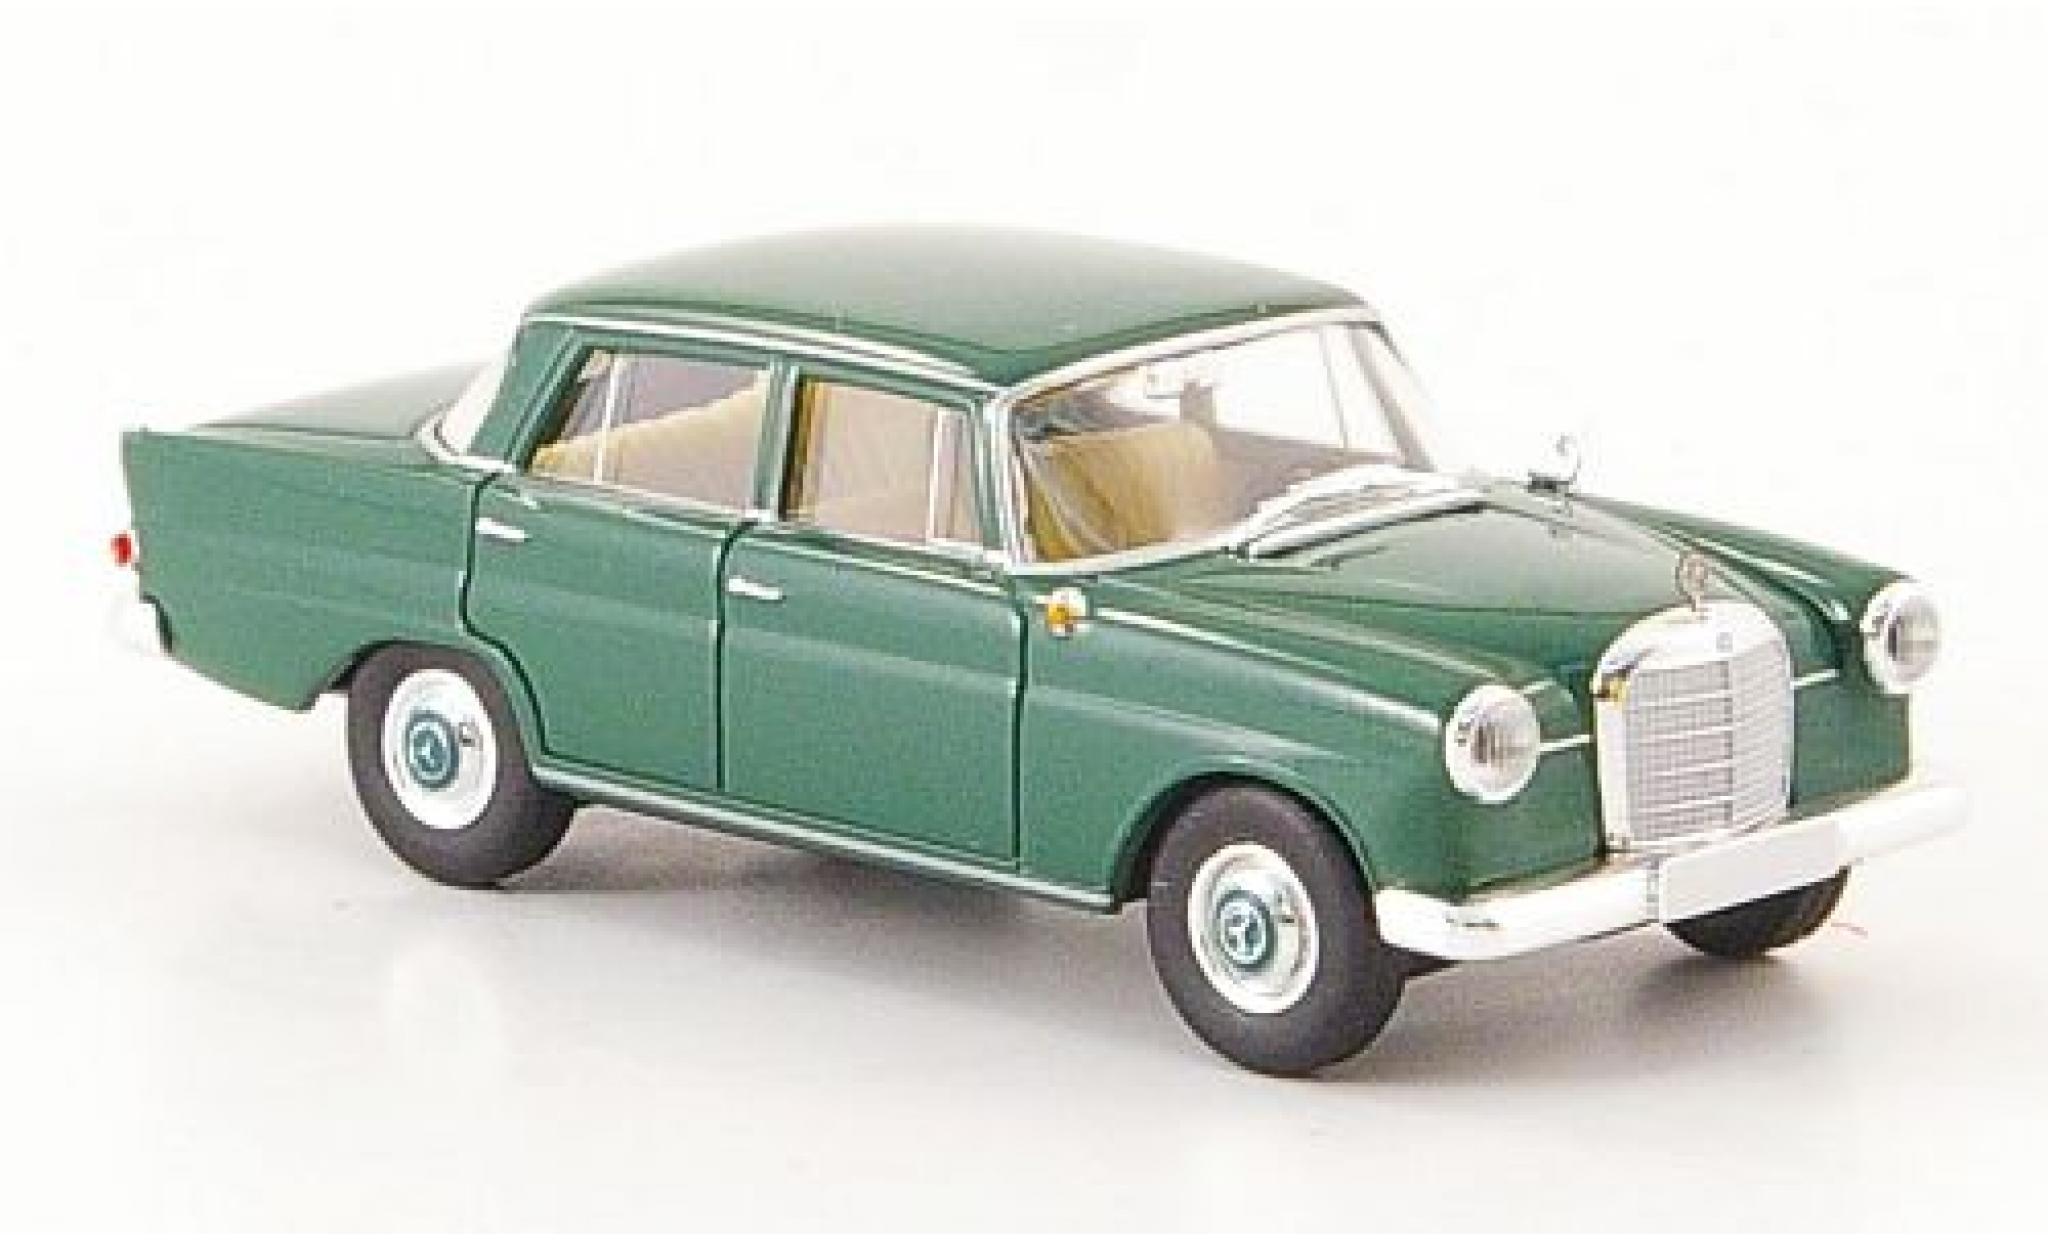 Mercedes 190 1/87 Brekina c (W 110) green ohne Vitrine